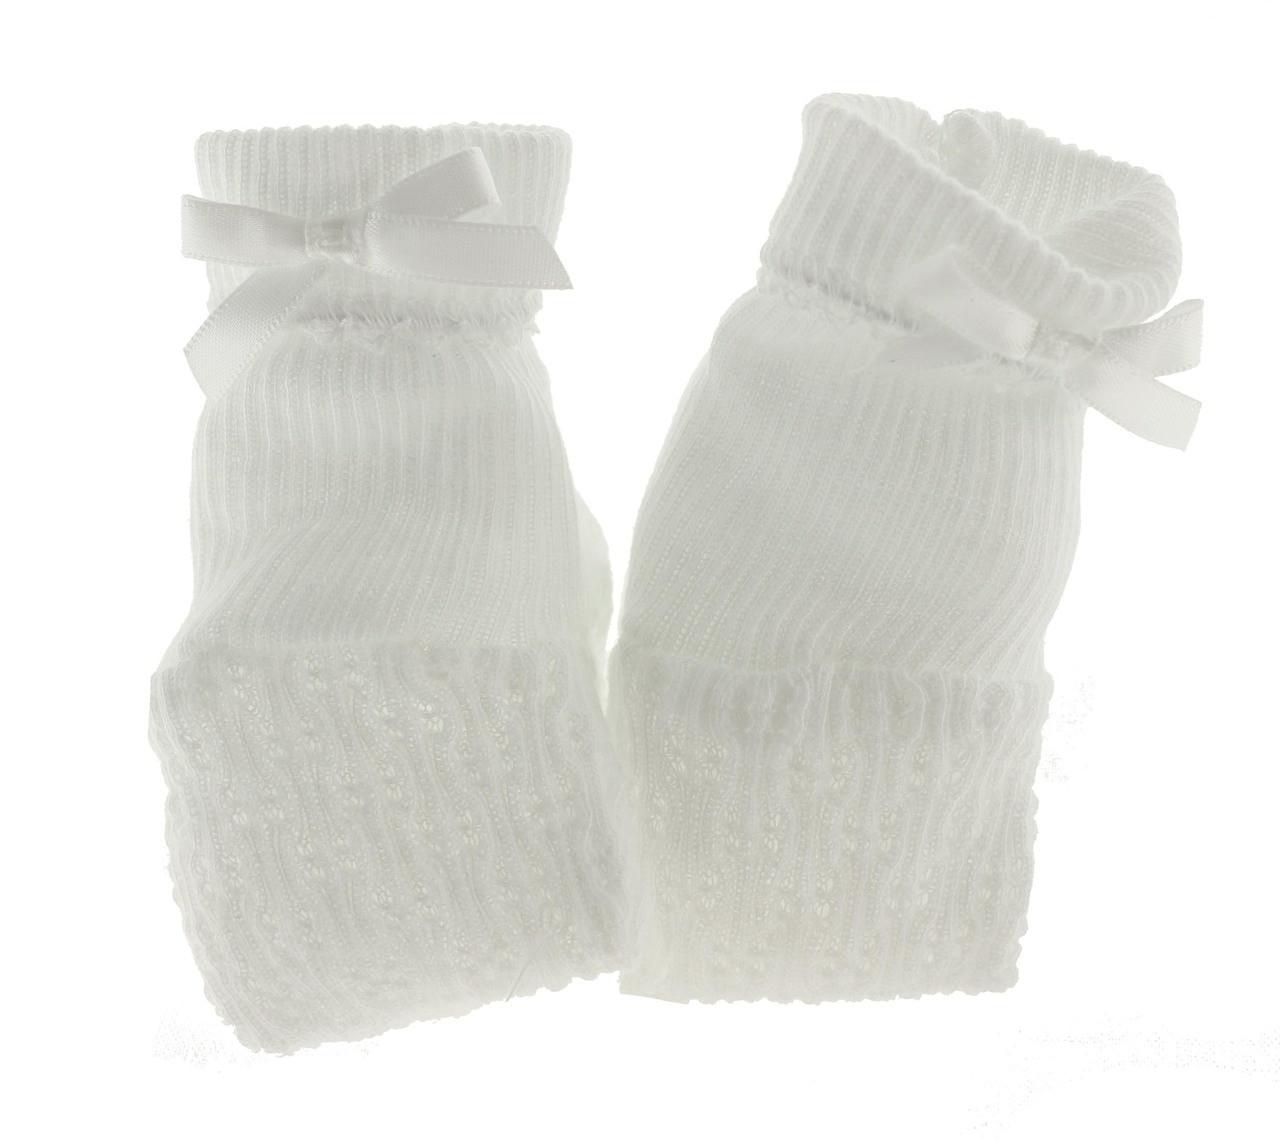 Newborn White Baby Booties Unisex  18a0b127d84b